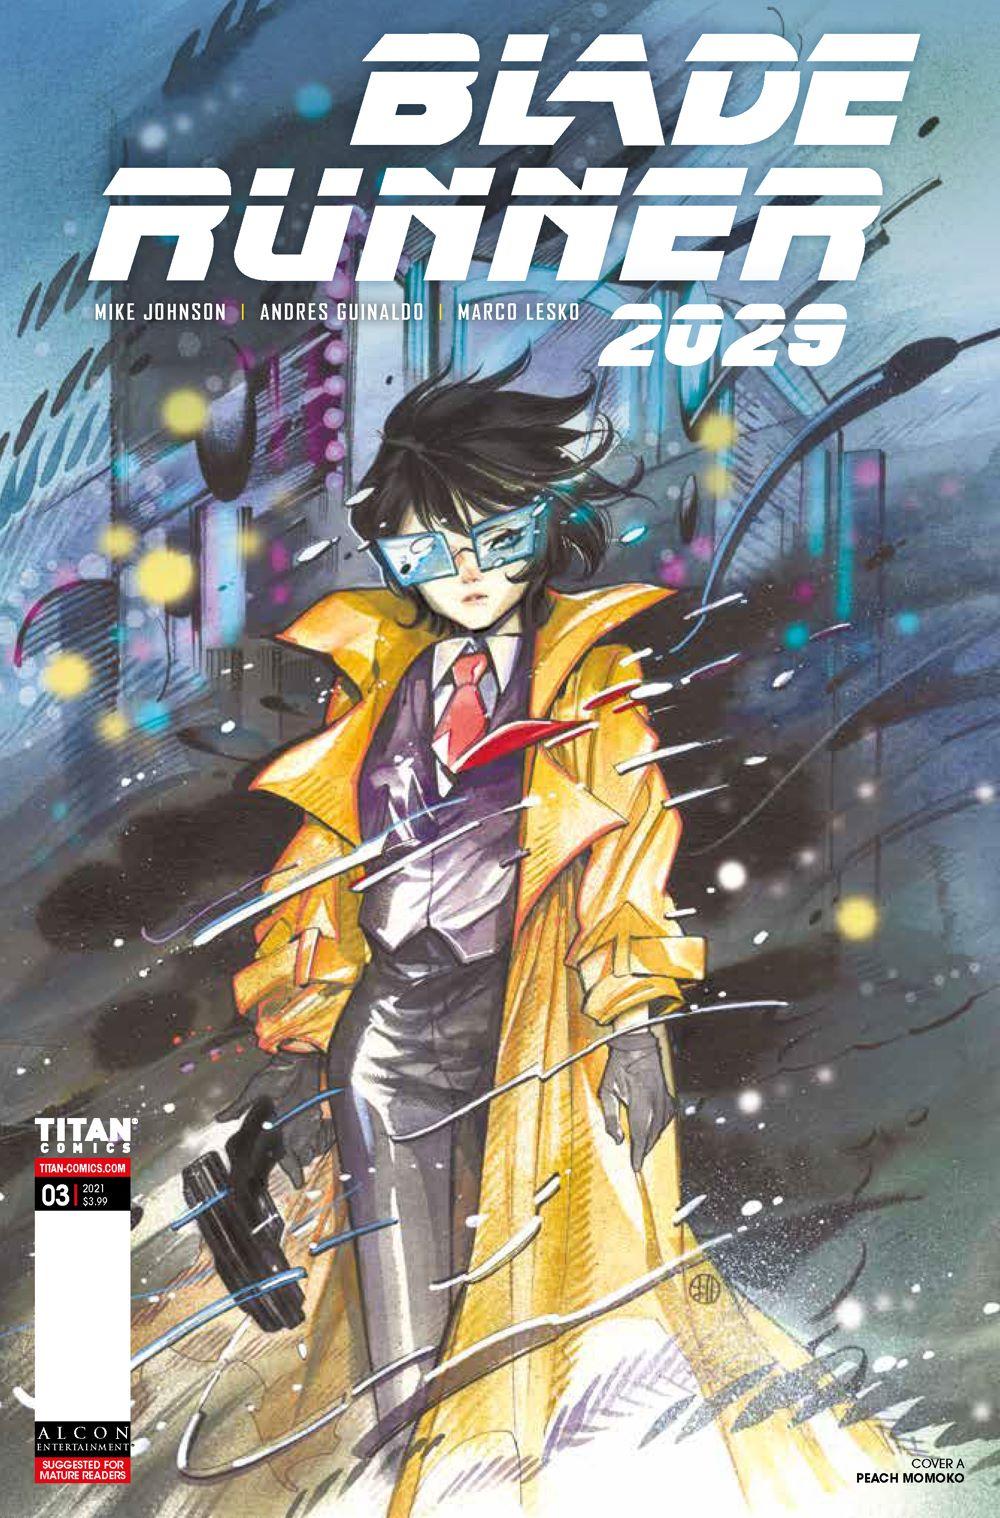 BR20293a ComicList Previews: BLADE RUNNER 2029 #3